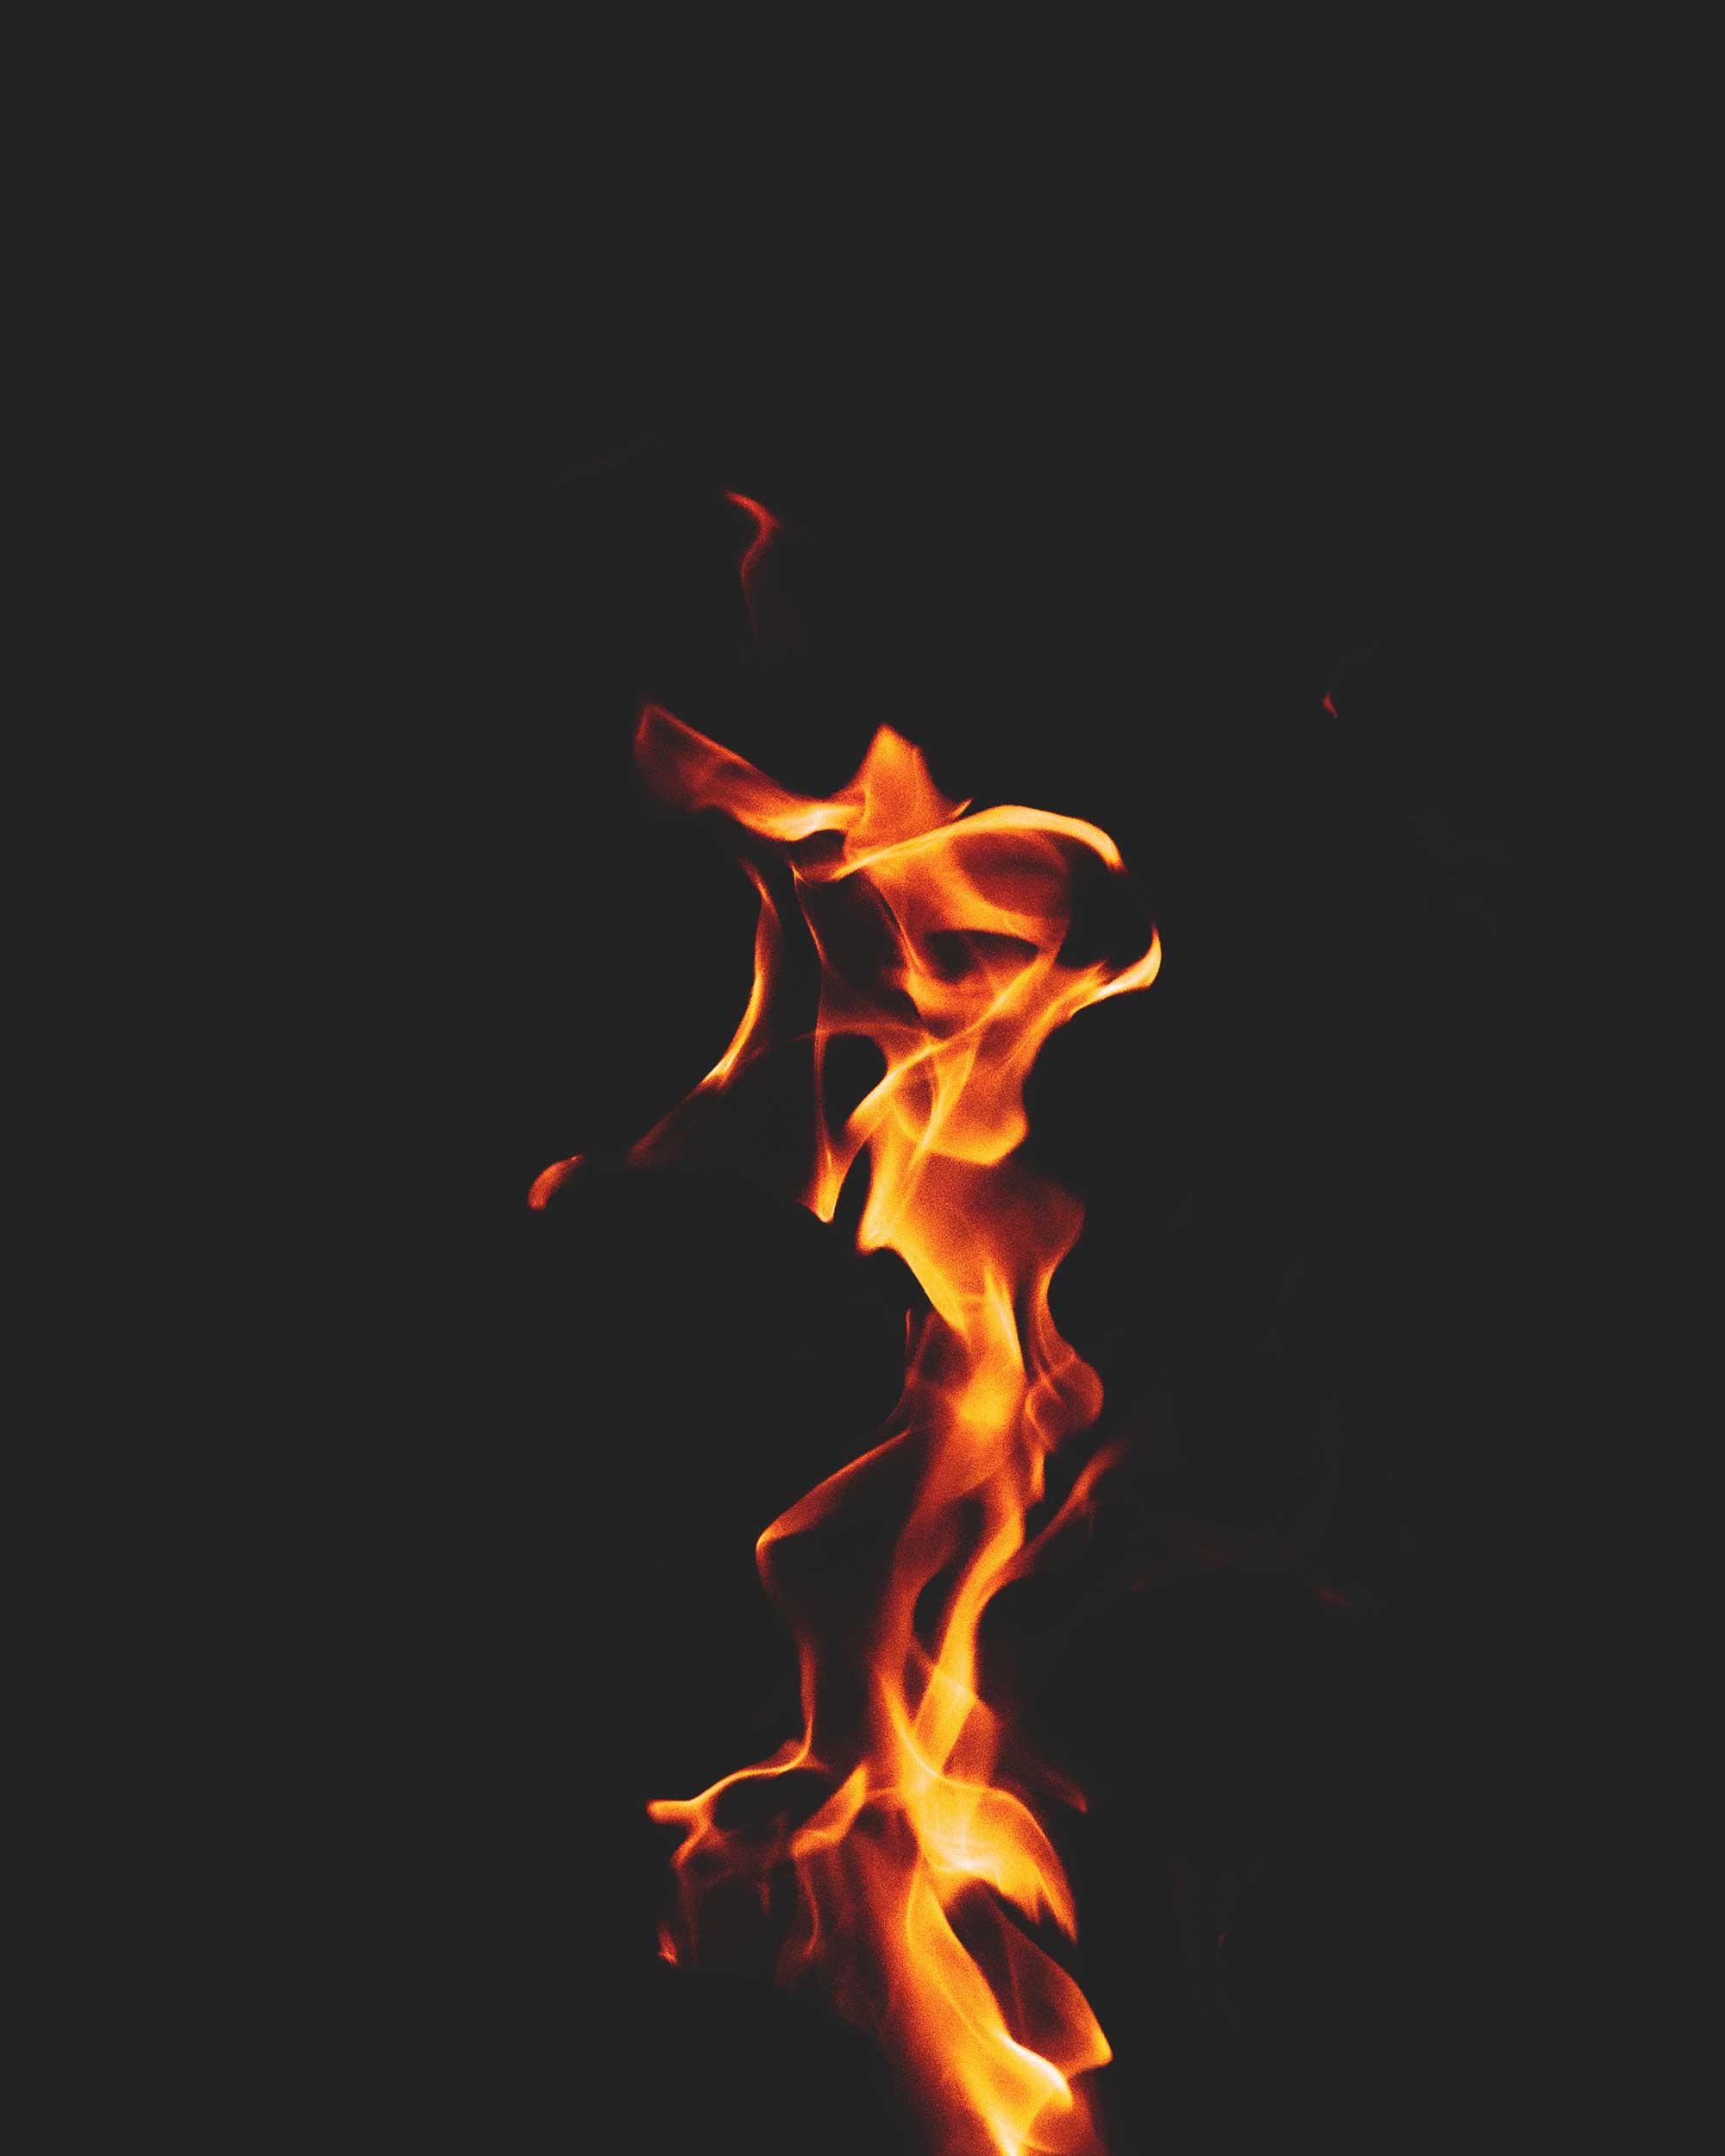 women of fire martin adams unsplash